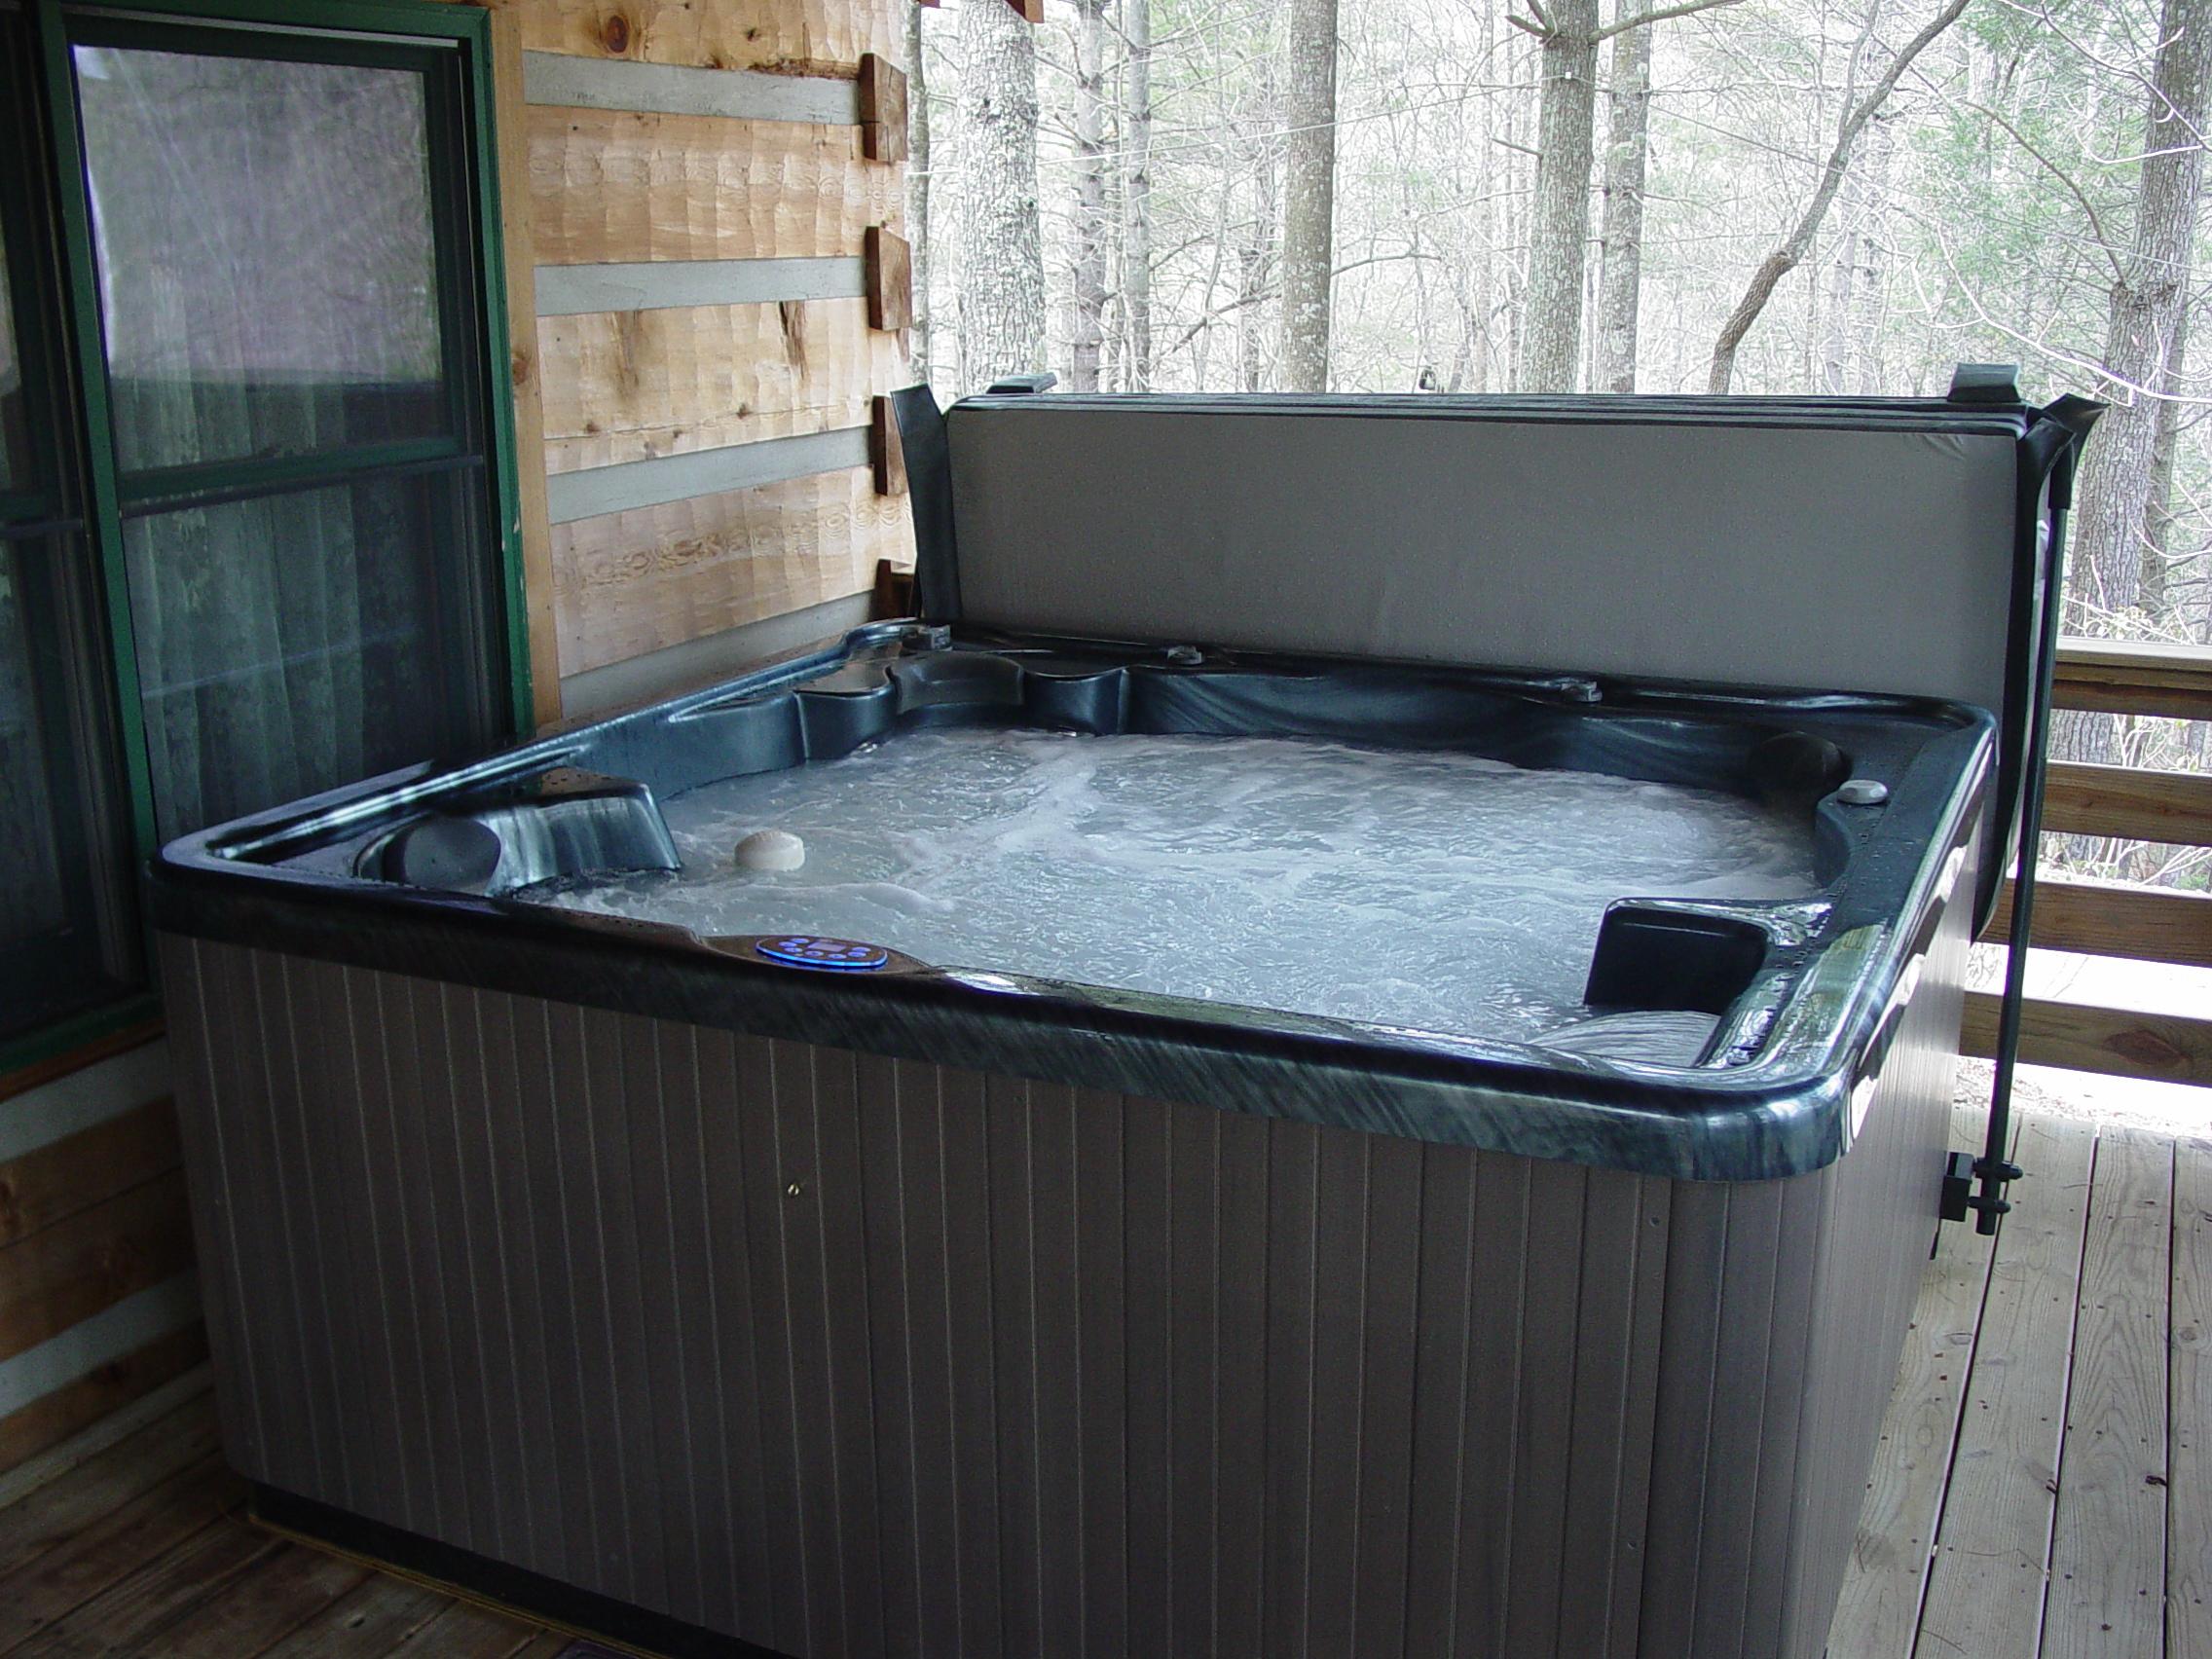 04.11.2013_Bubbling Hot Tub_ 003.JPG